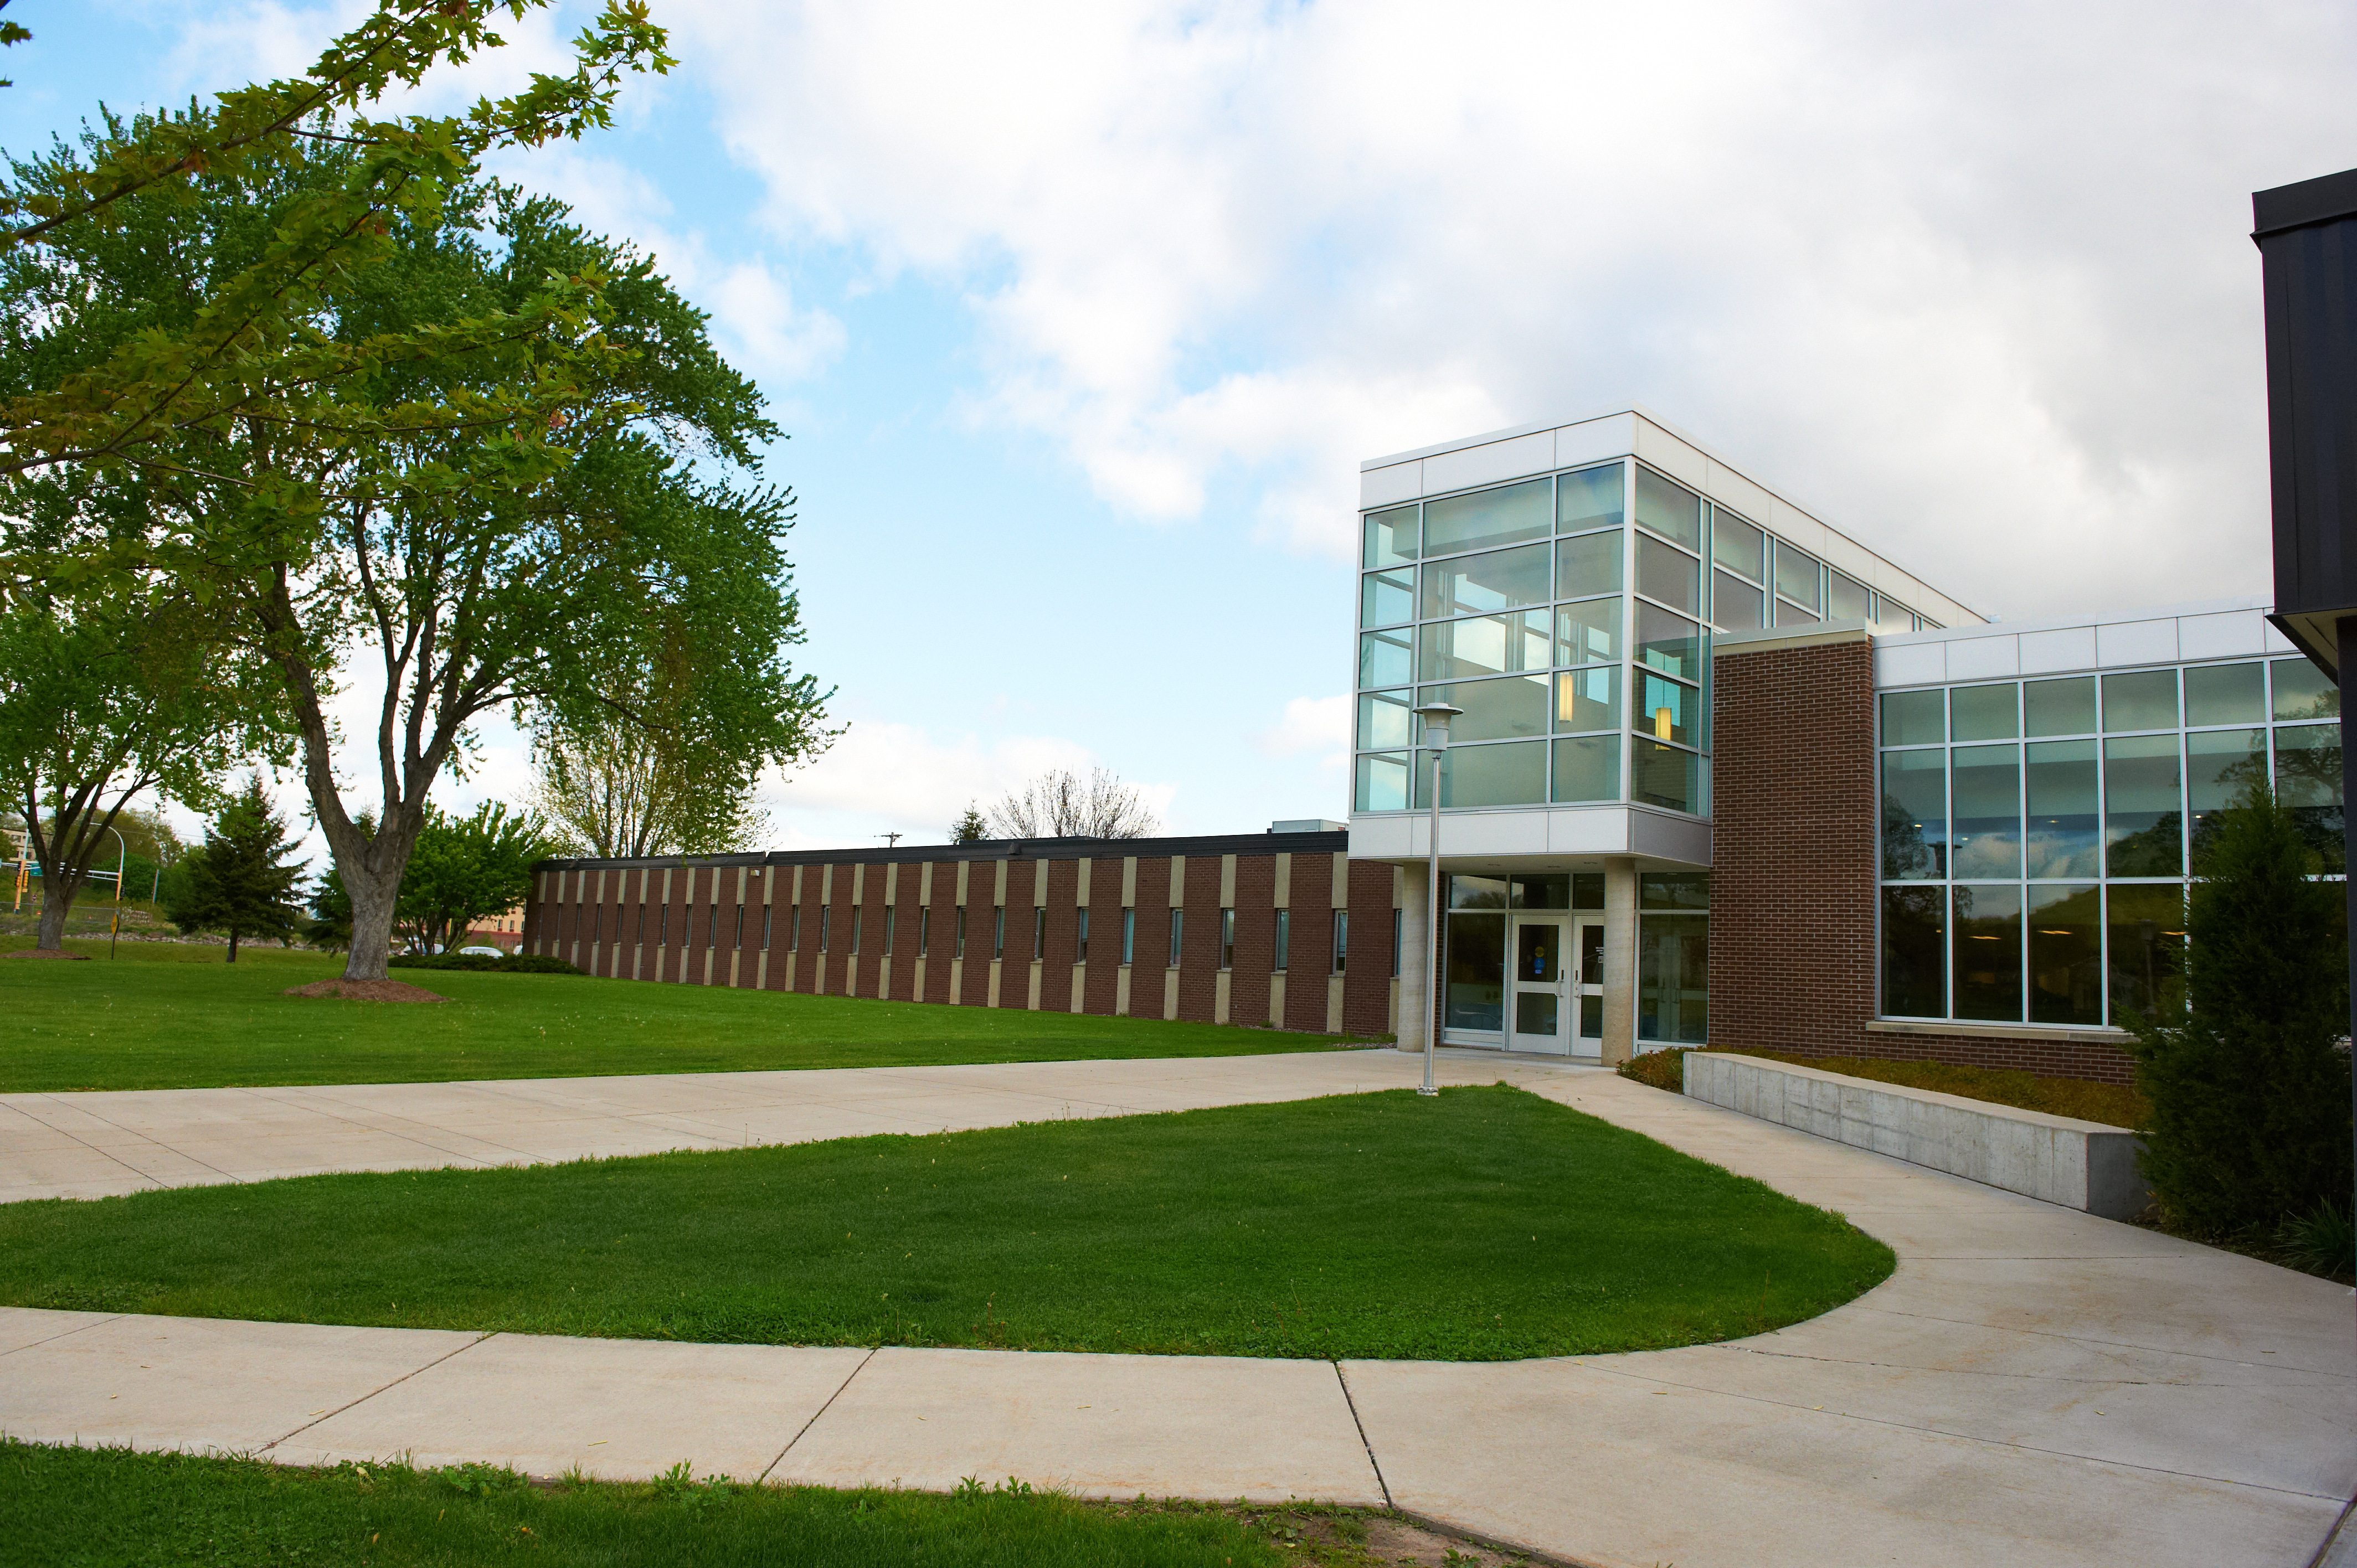 minnesota state college southeast